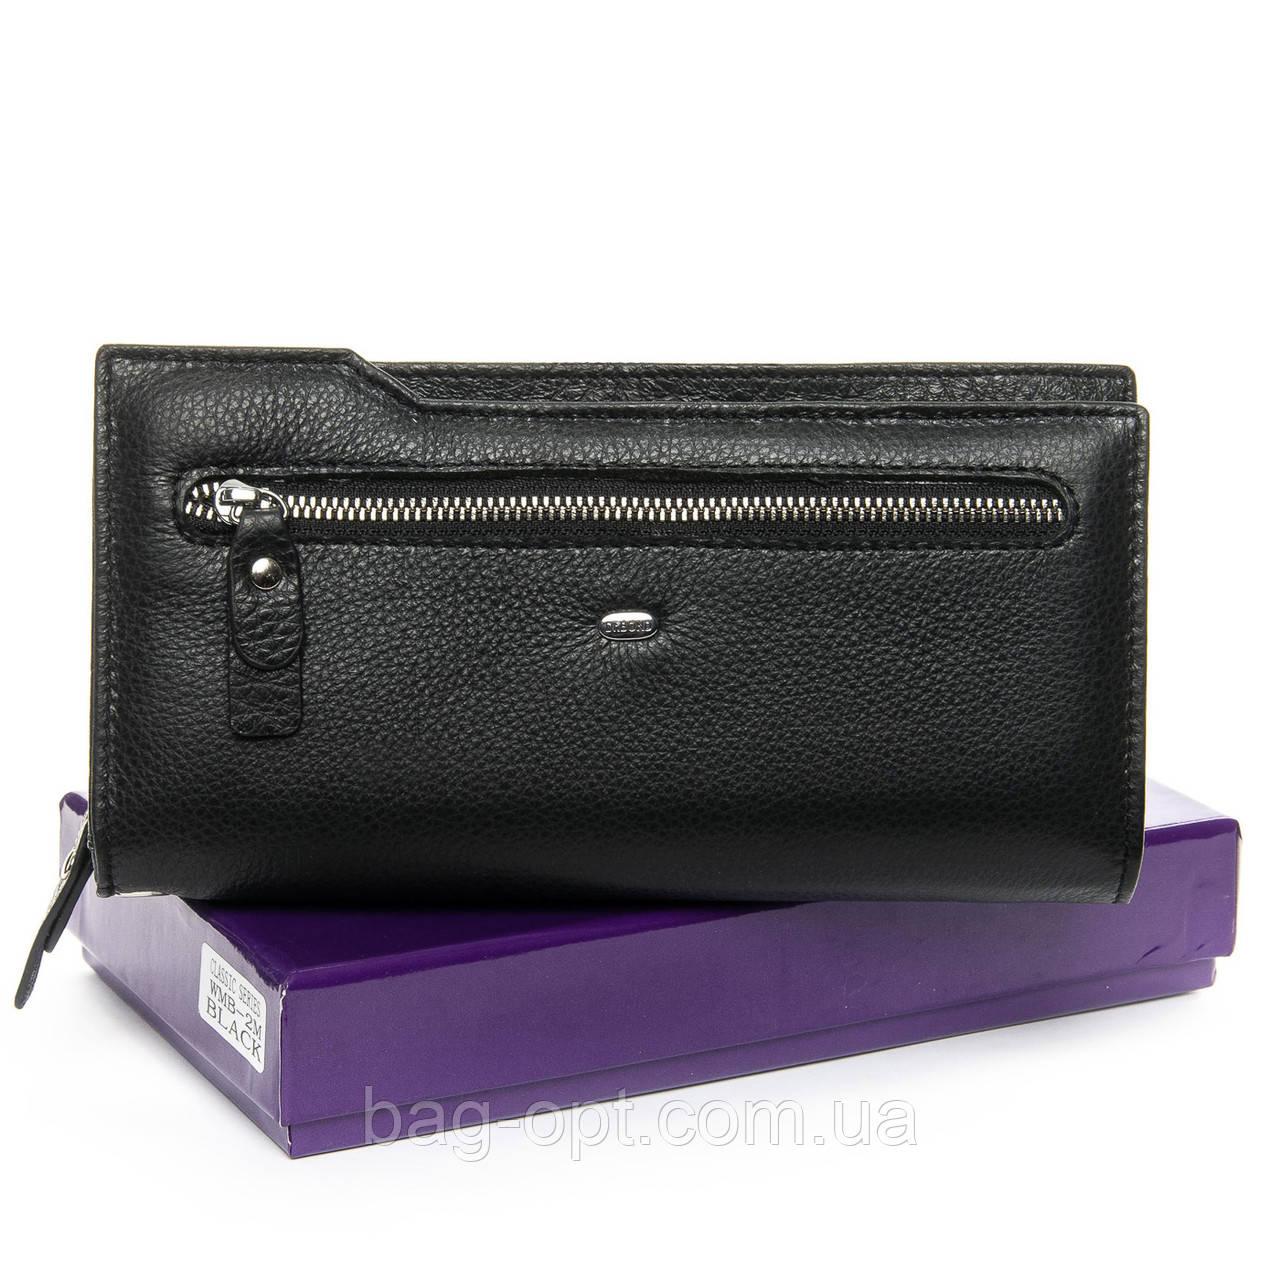 Женский кошелек Dr. Bond  (19,5x10,5x3 см)